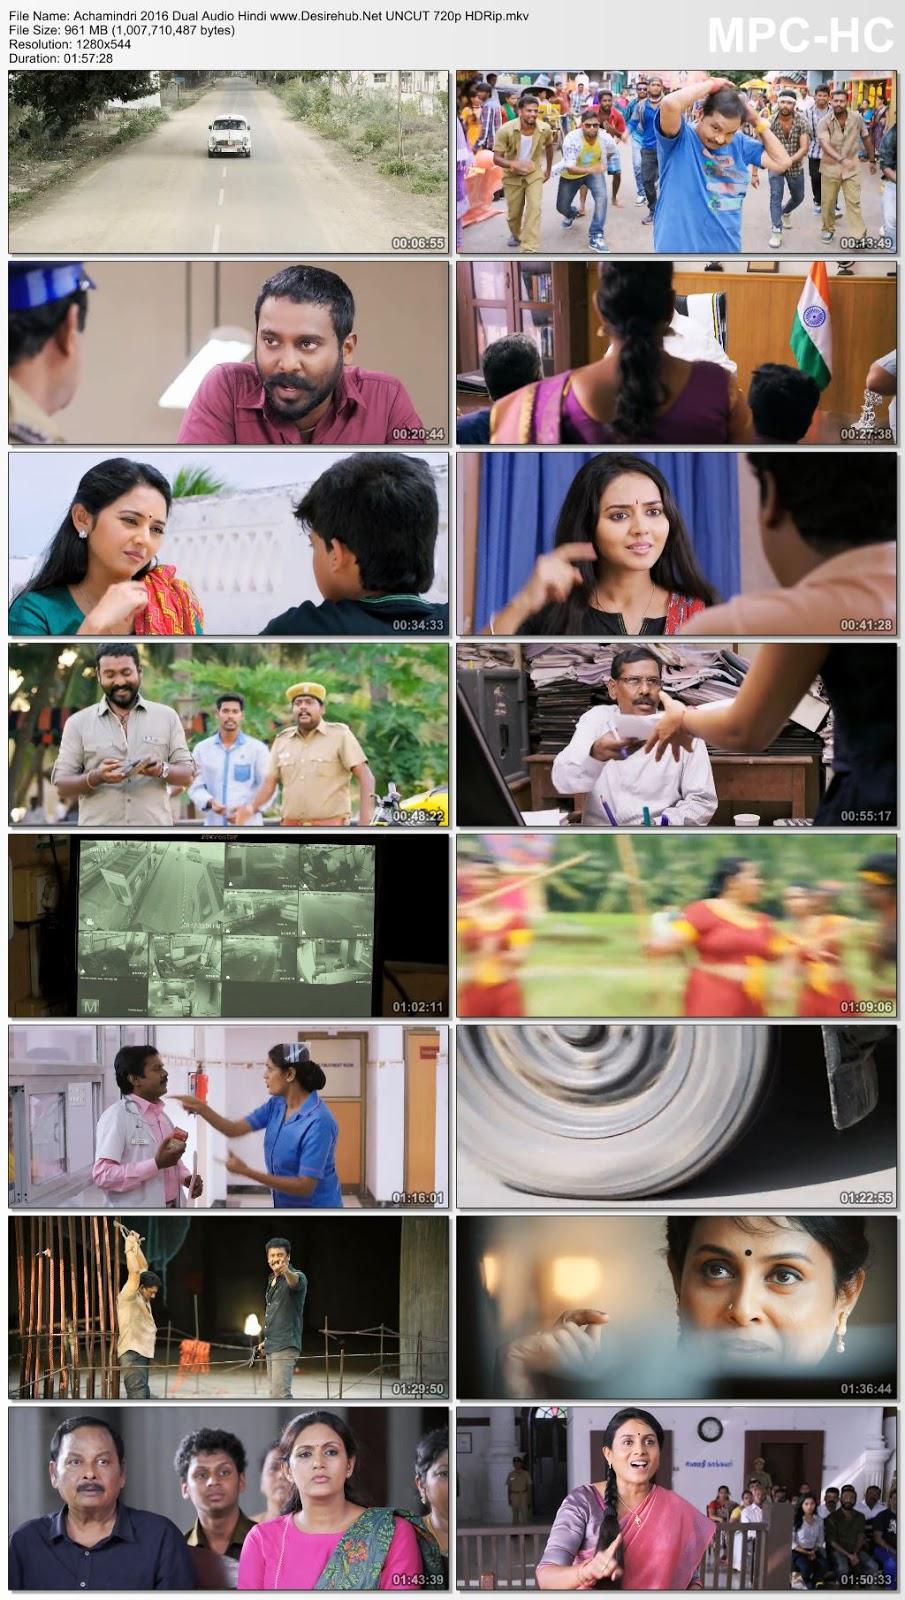 Achamindri 2016 Dual Audio Hindi UNCUT 720p HDRip 950MB Desirehub